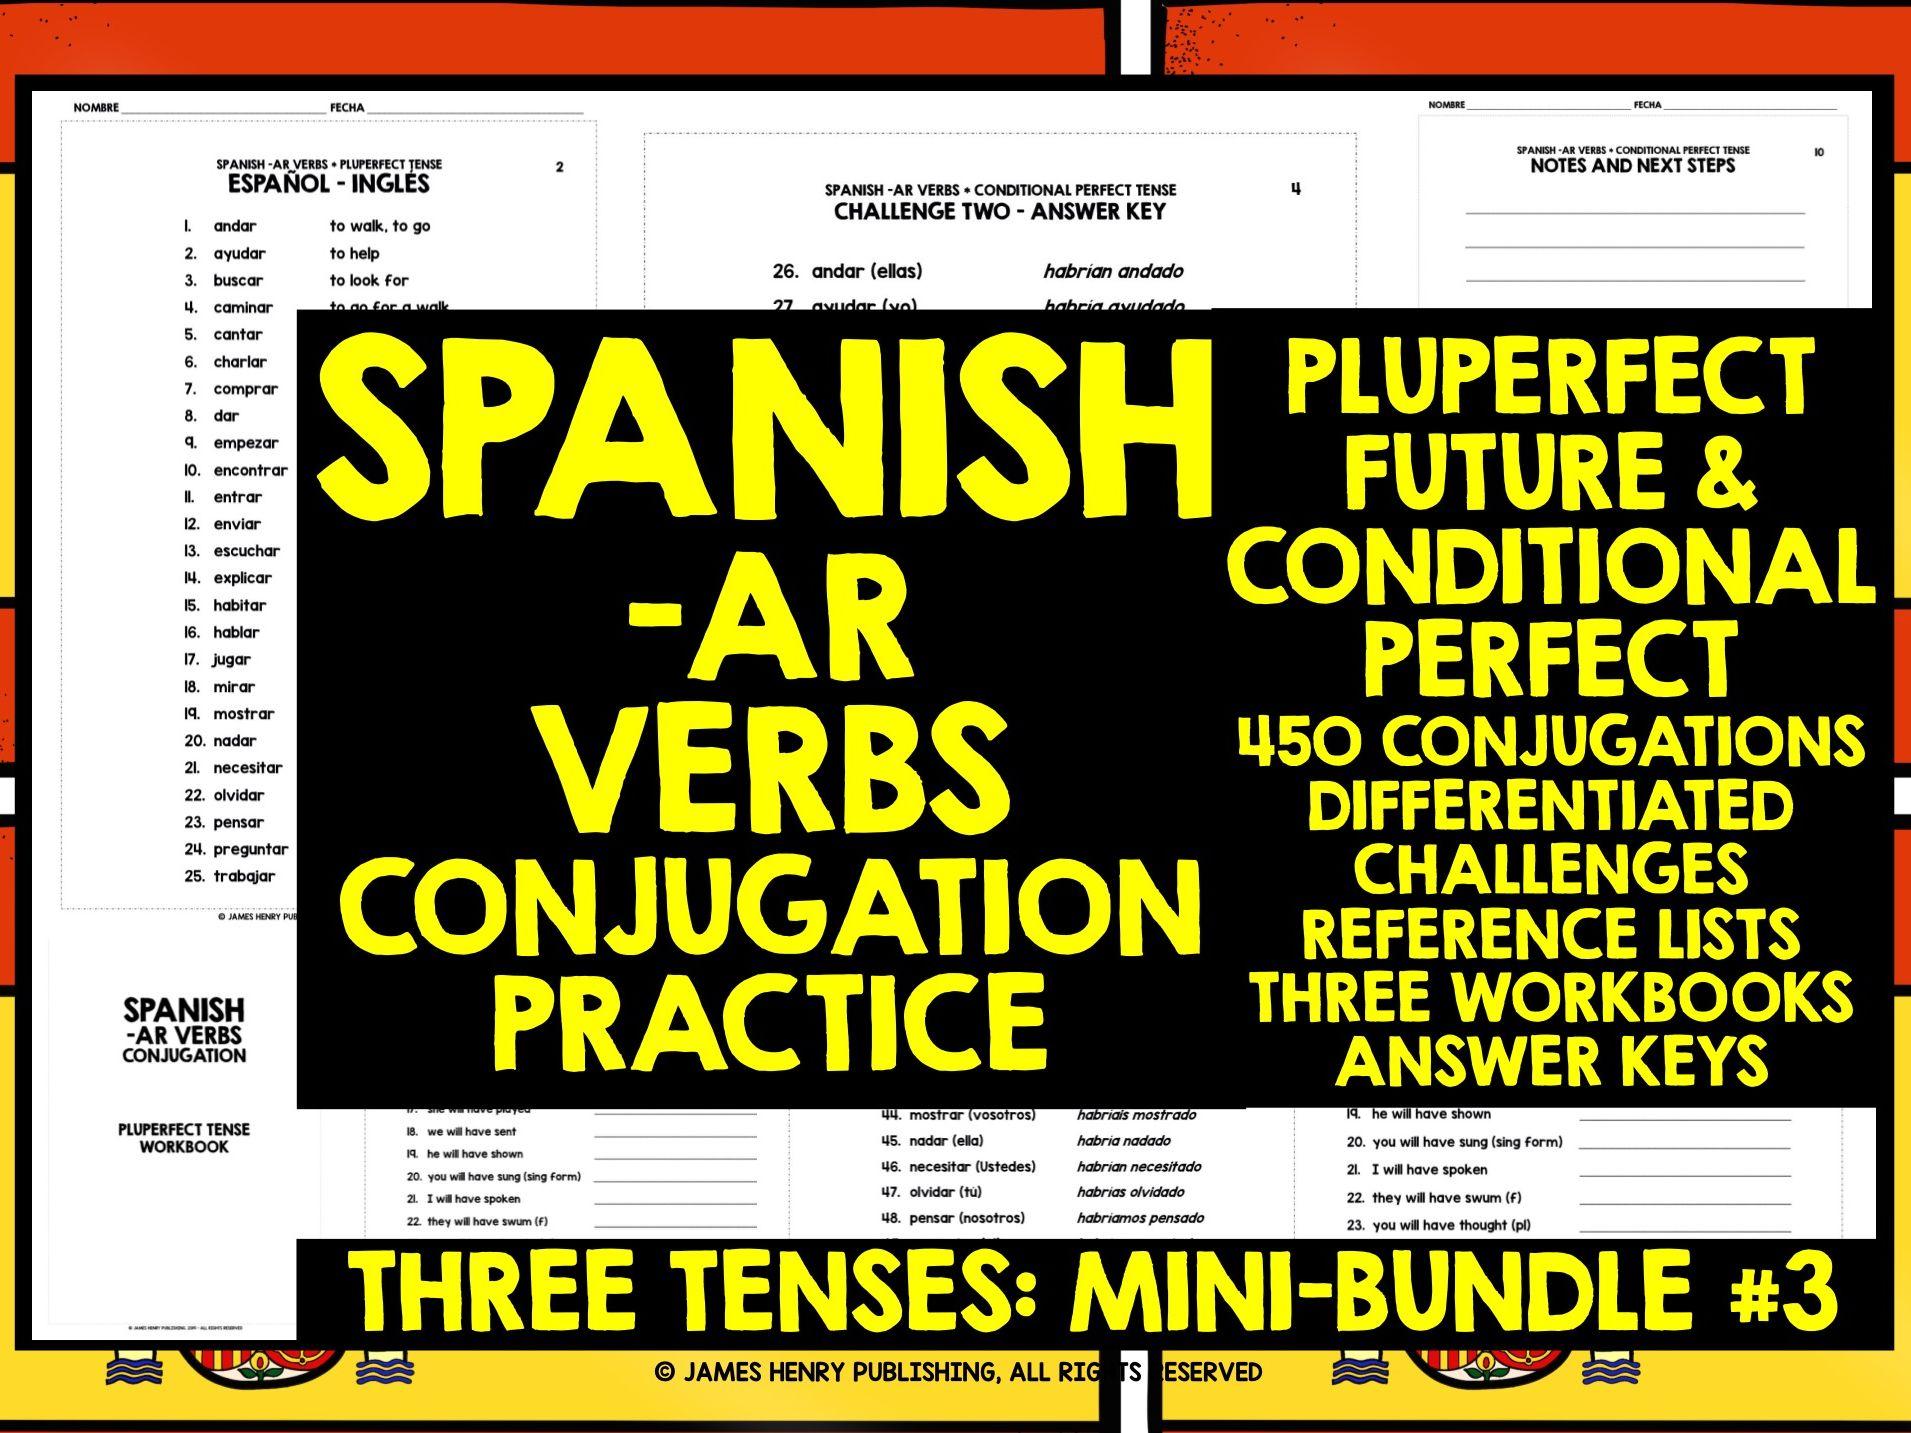 SPANISH -AR VERBS CONJUGATION MINI-BUNDLE #3